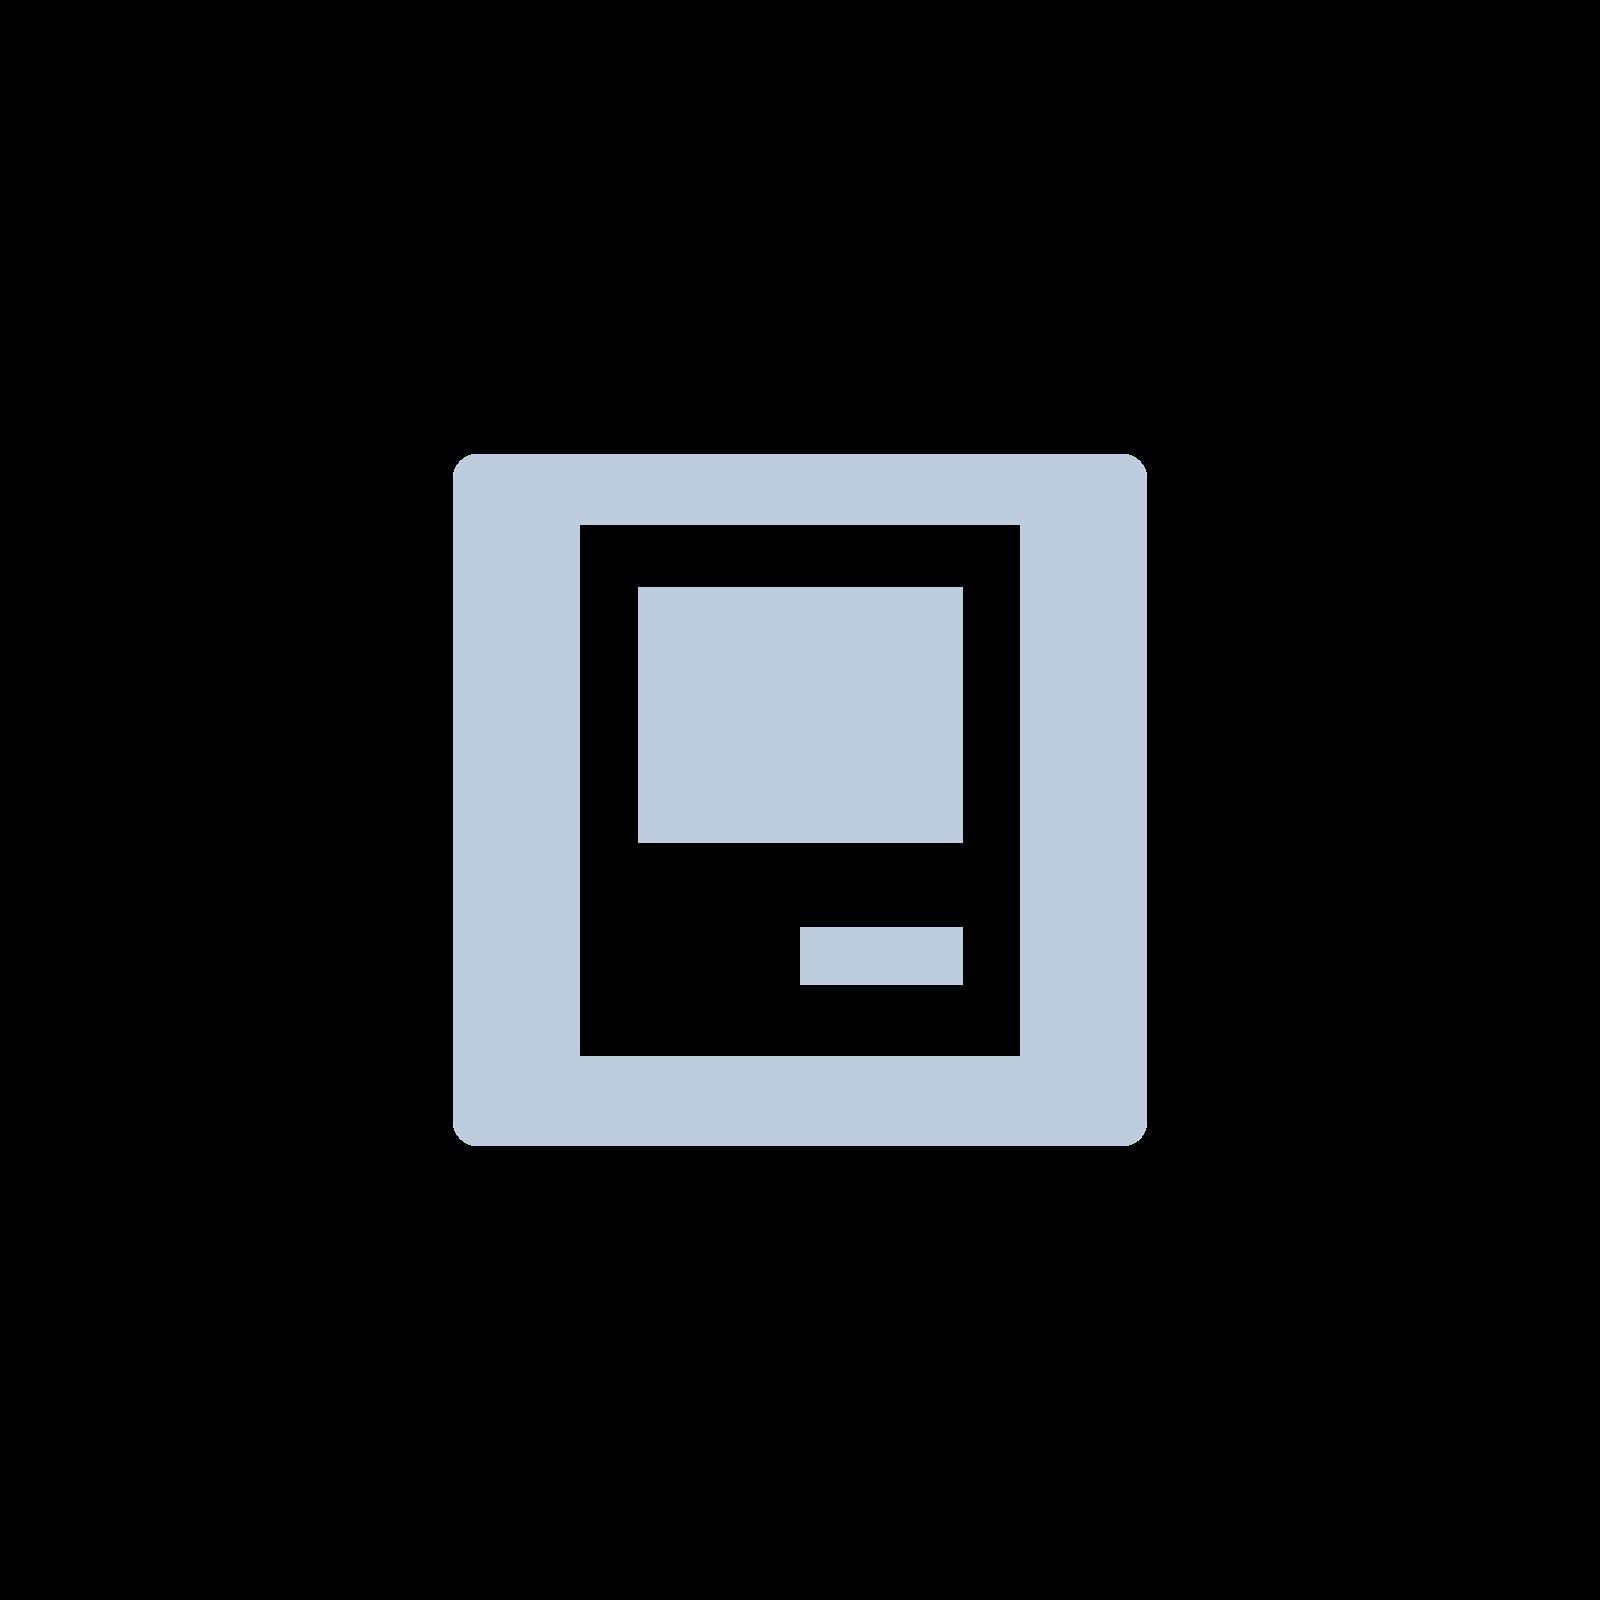 Mac Pro Intel QuadCore 3.2GHz (MacPro5,1)